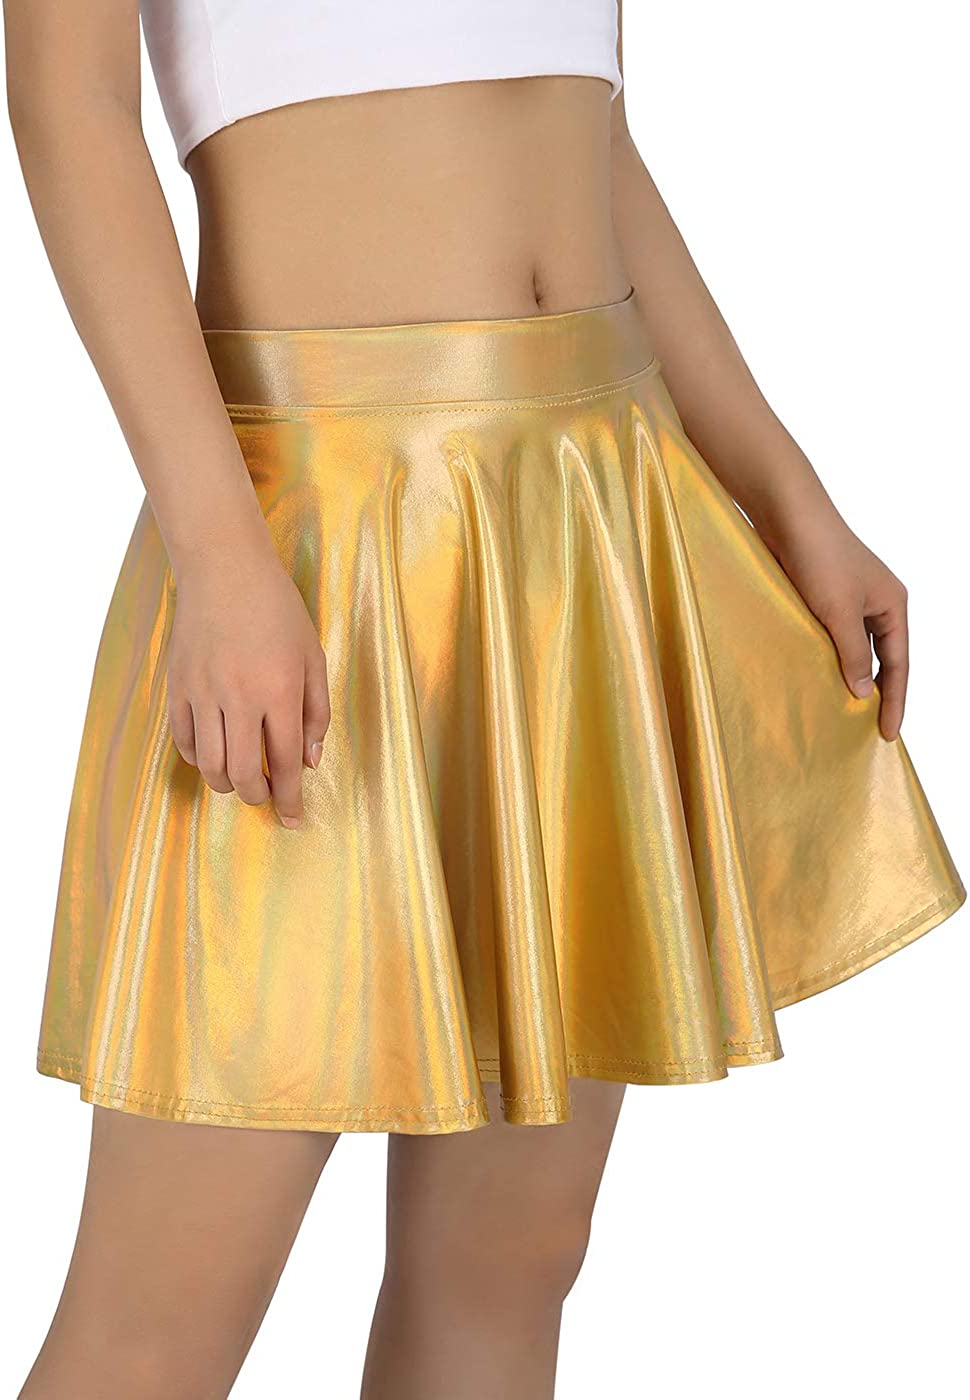 HDE Women's Shiny Liquid Metallic Holographic Pleated Flared Mini Skater Skirt